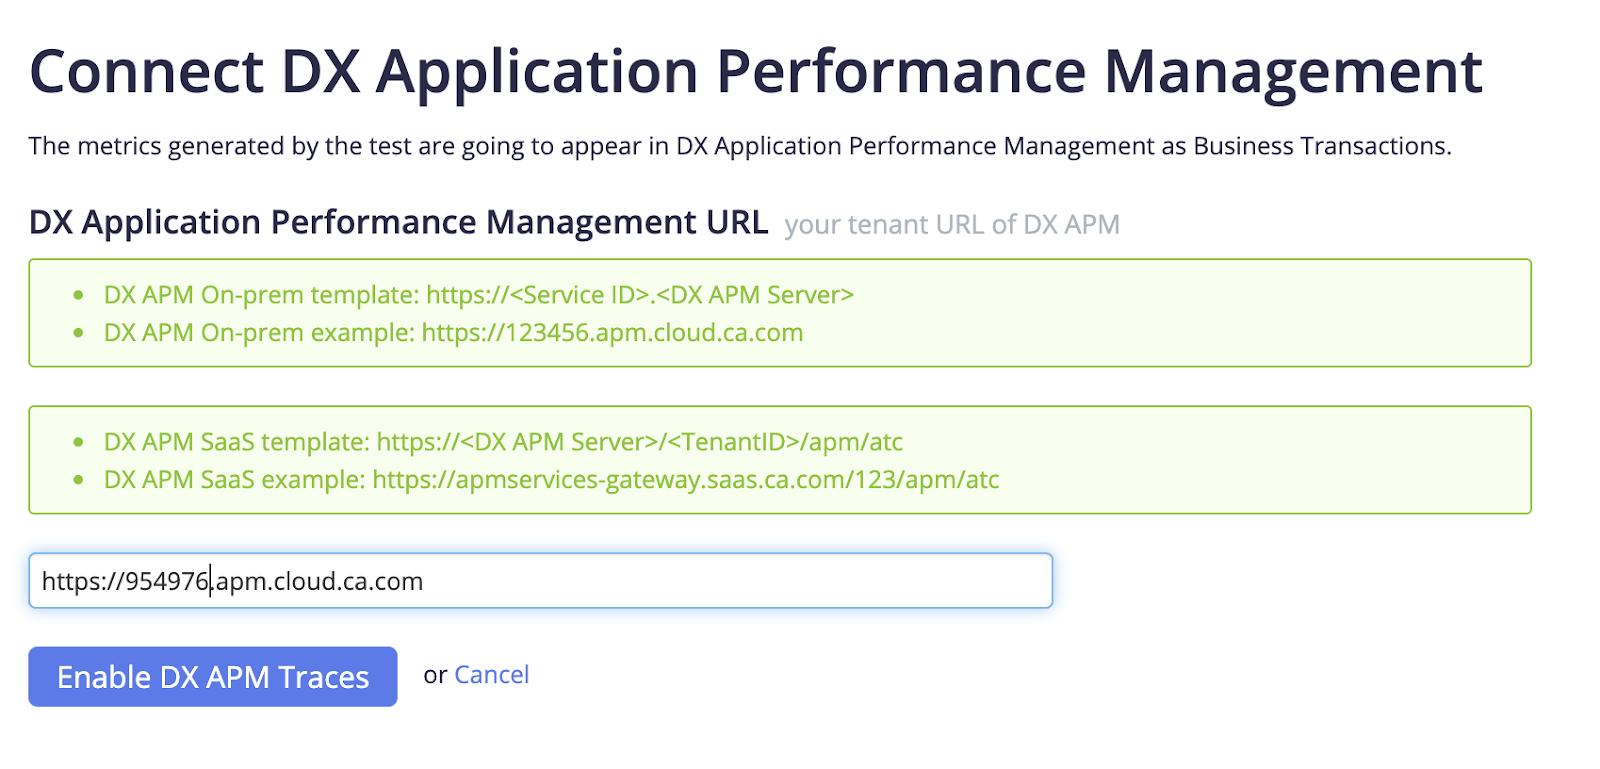 DX Application Performance Management